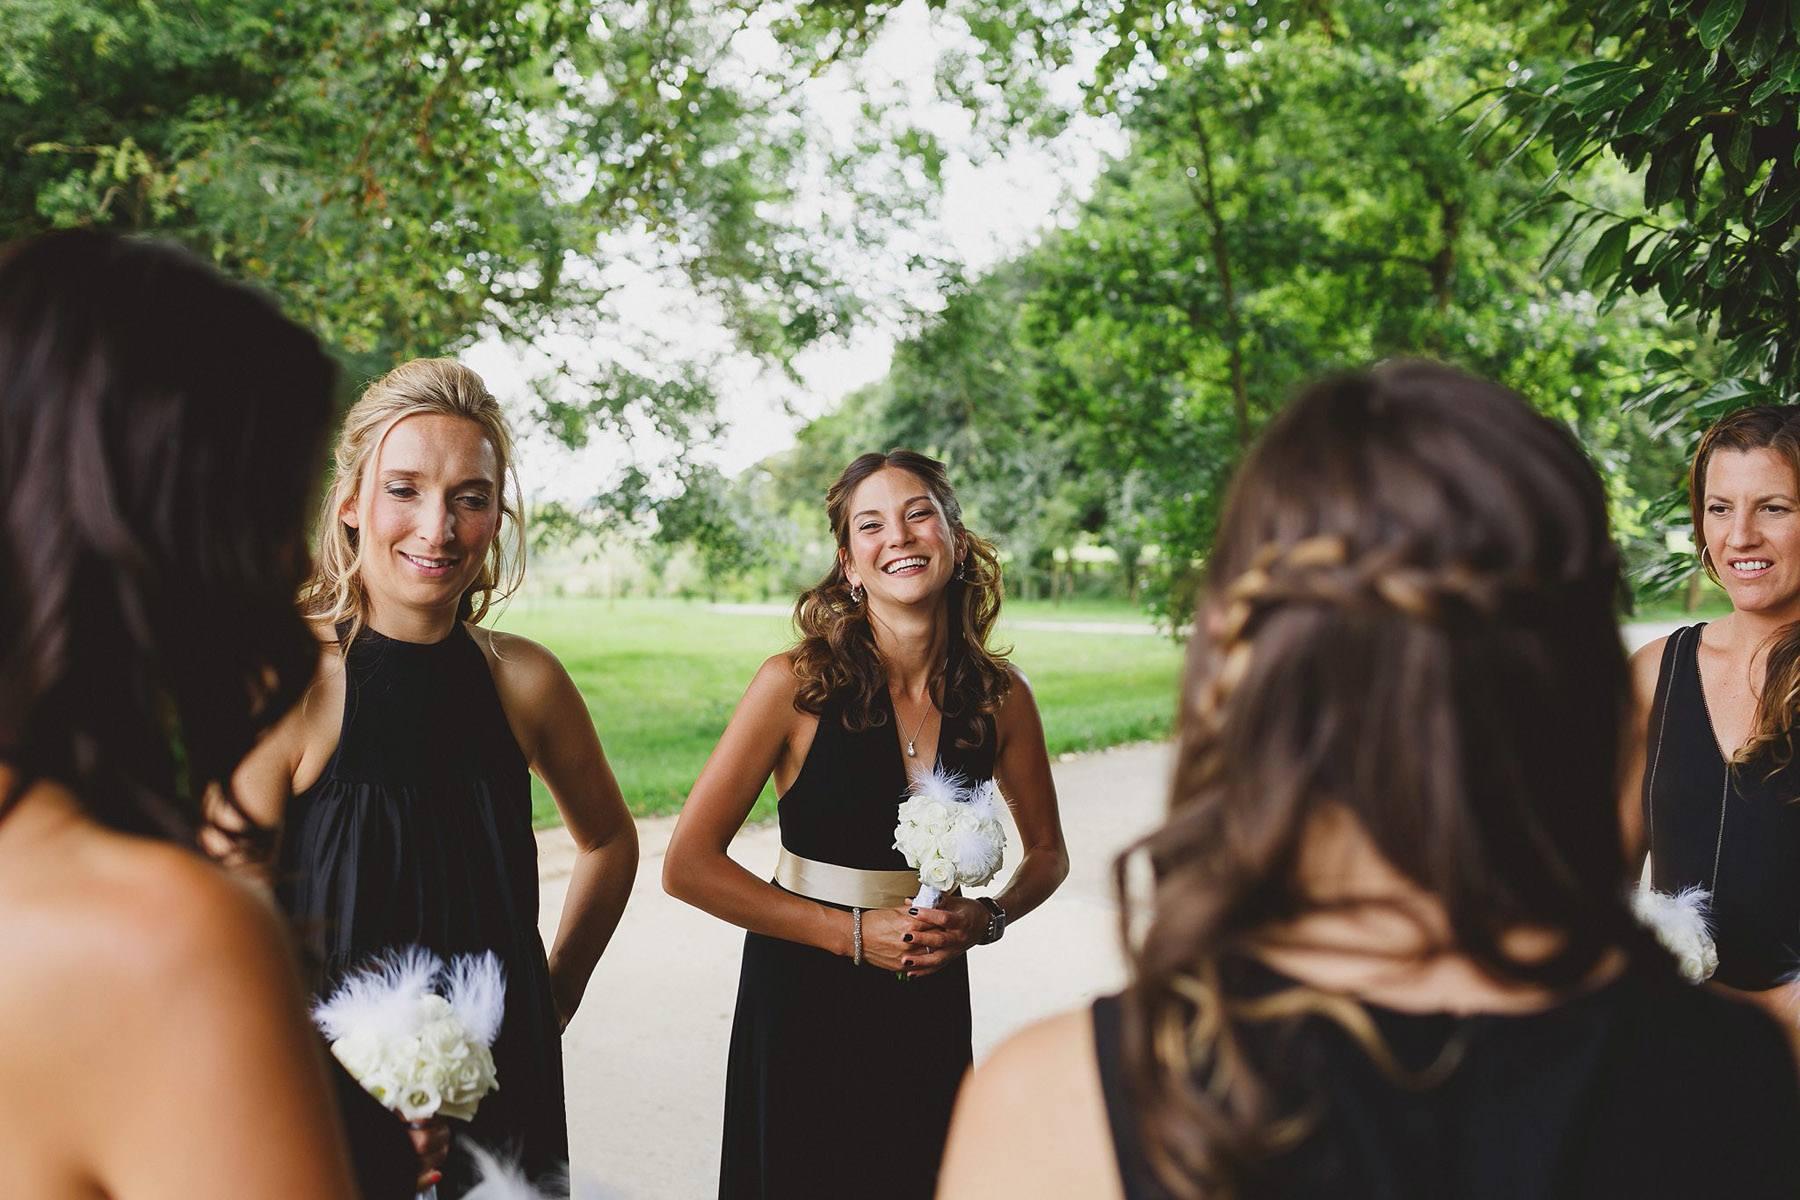 oxfordshire-wedding-photographer-023